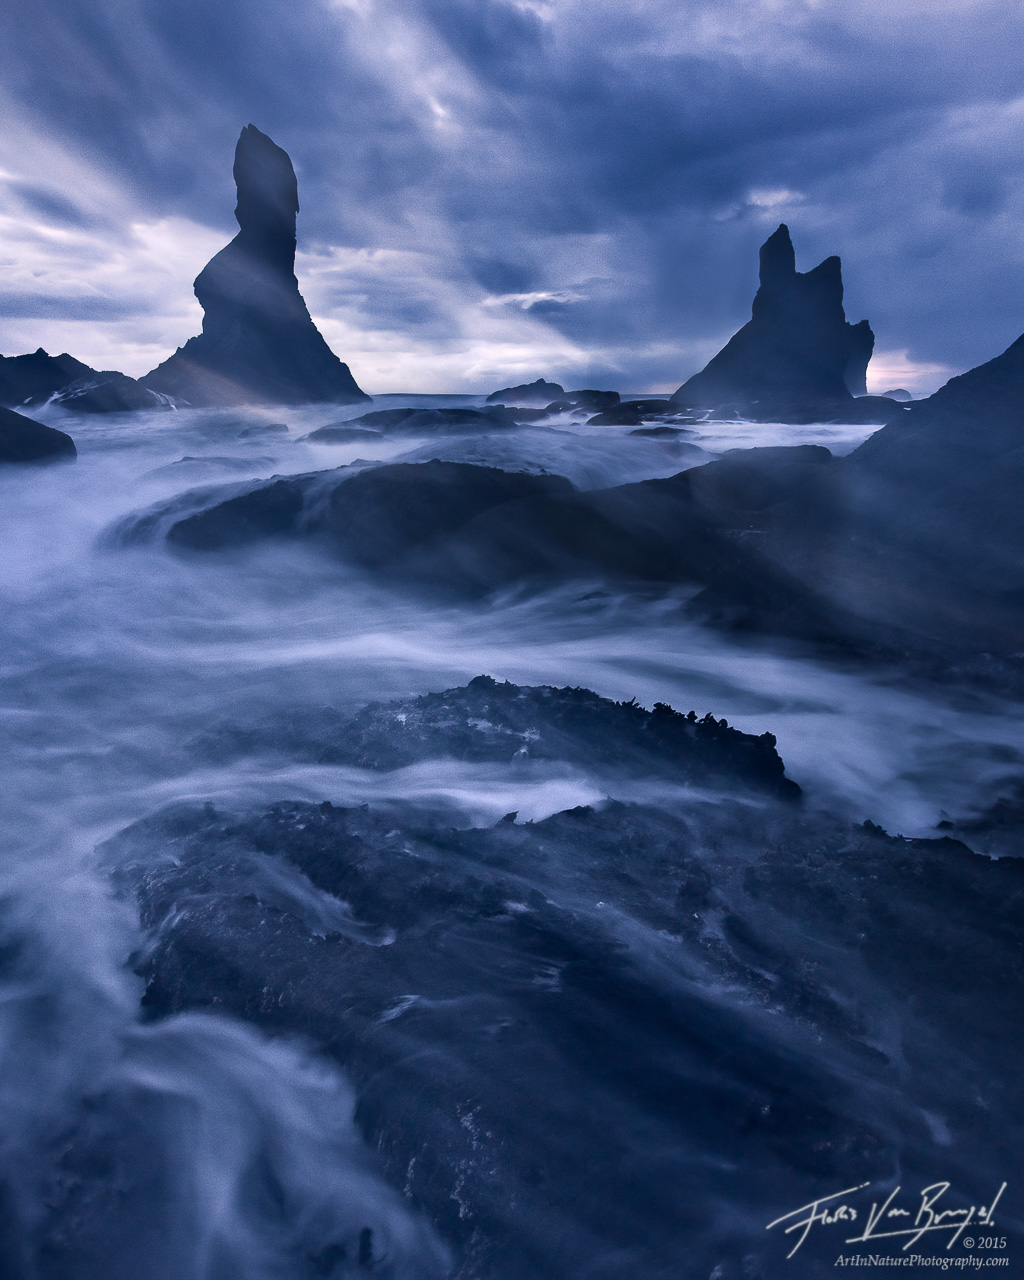 Storm on the Coast, Olympic National Park, Washington, Poseidon's Wrath, wave, photo